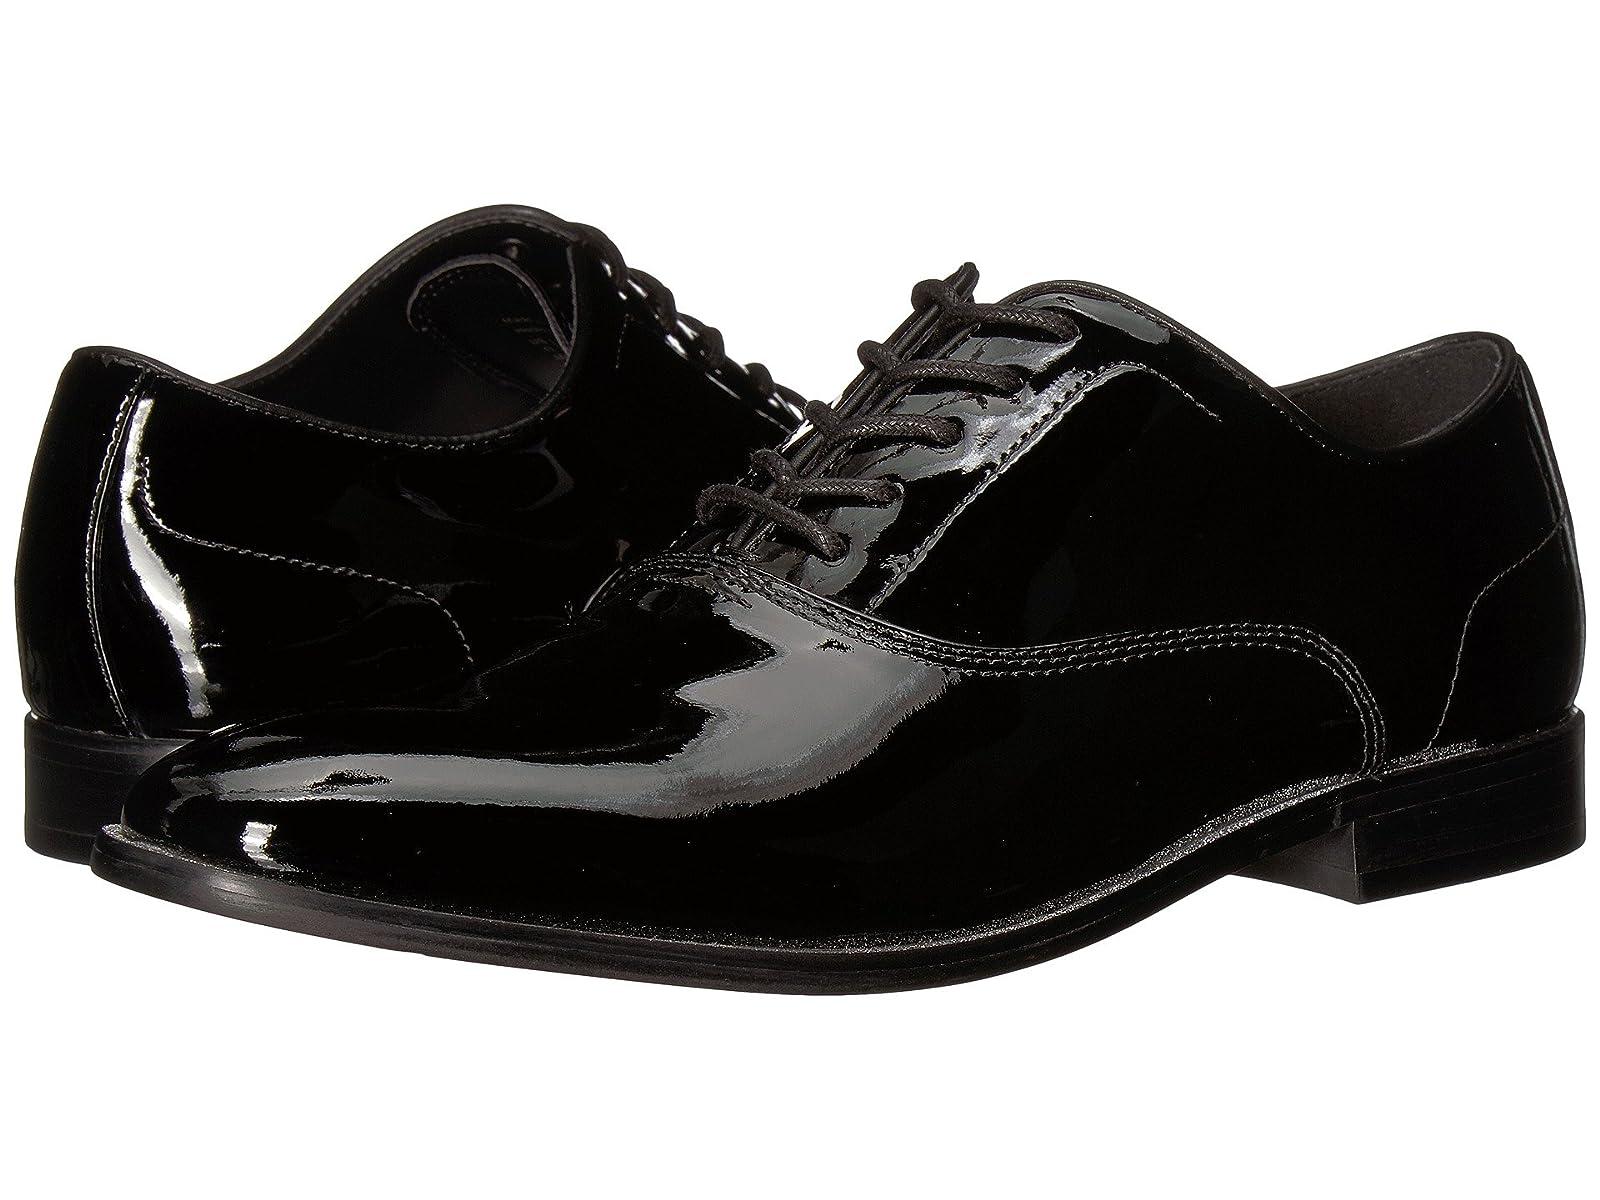 ALDO CollamatoCheap and distinctive eye-catching shoes